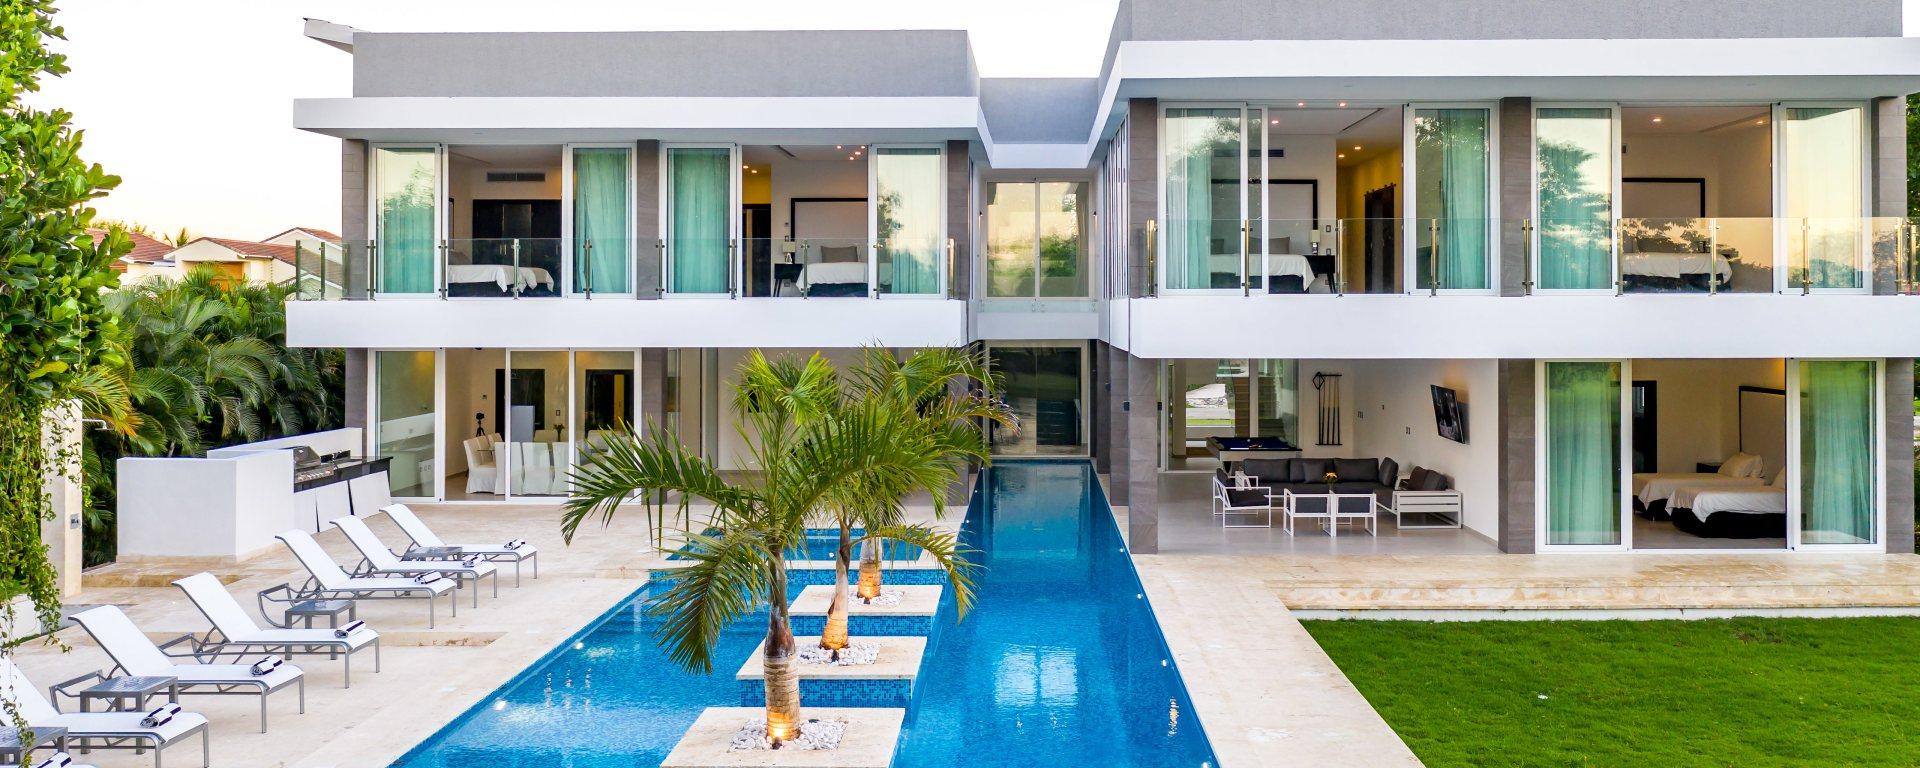 Villa Palma Punta Cana